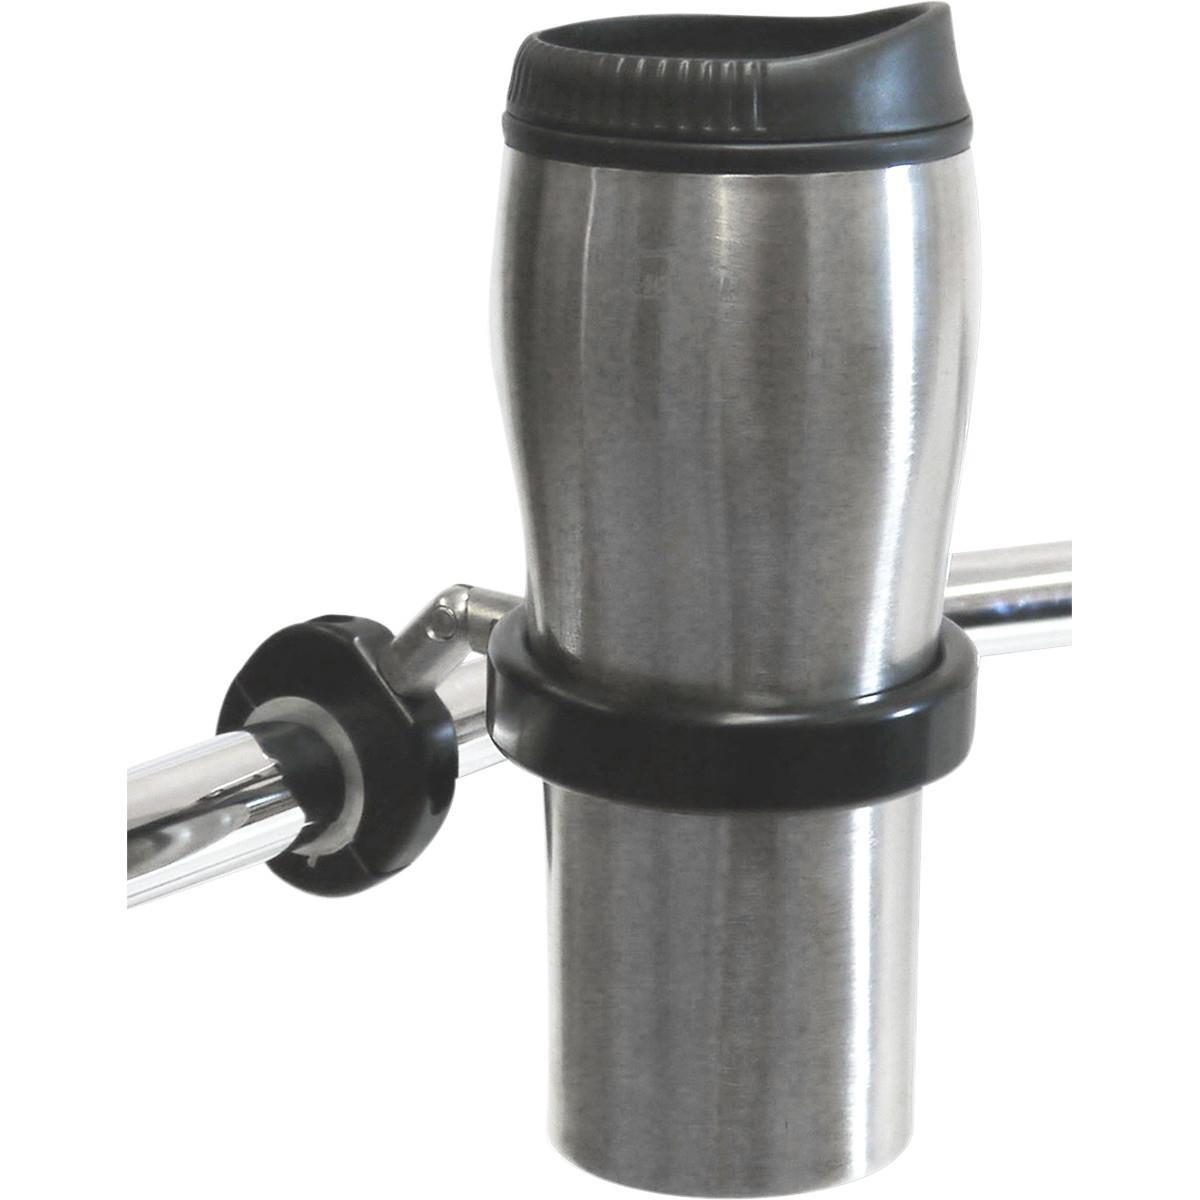 Desert Dawgs RUMFB RoadRunner PLUS Drink Holder w/Travel Mug - 1in. thru 1-1/4in. - Black